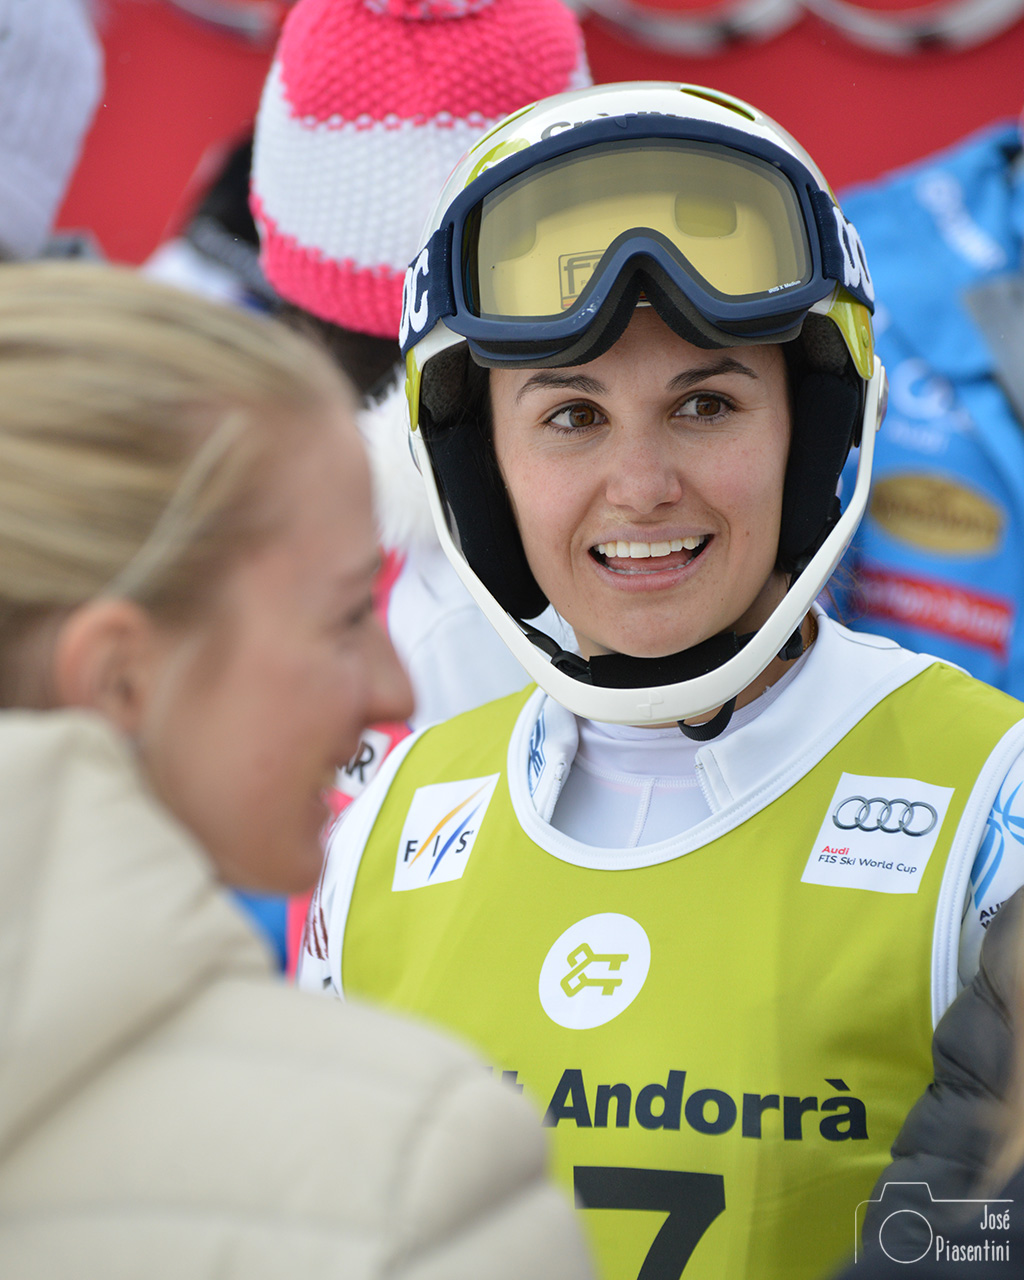 Mimi-Gutierrez-Andorra